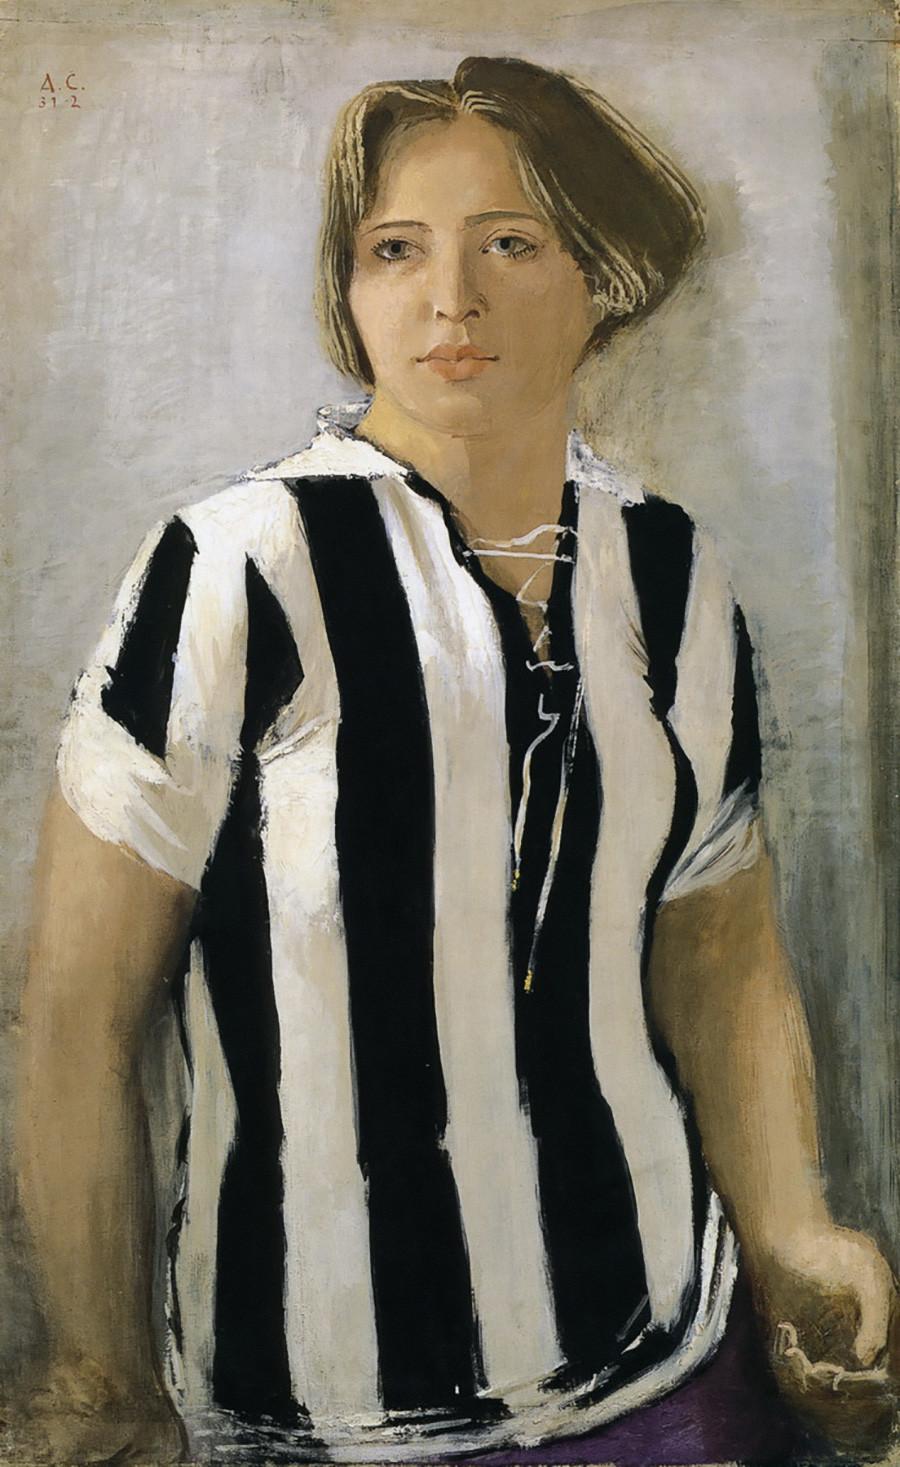 Alexander Samokhvalov. Girl in a Sports Shirt, 1932